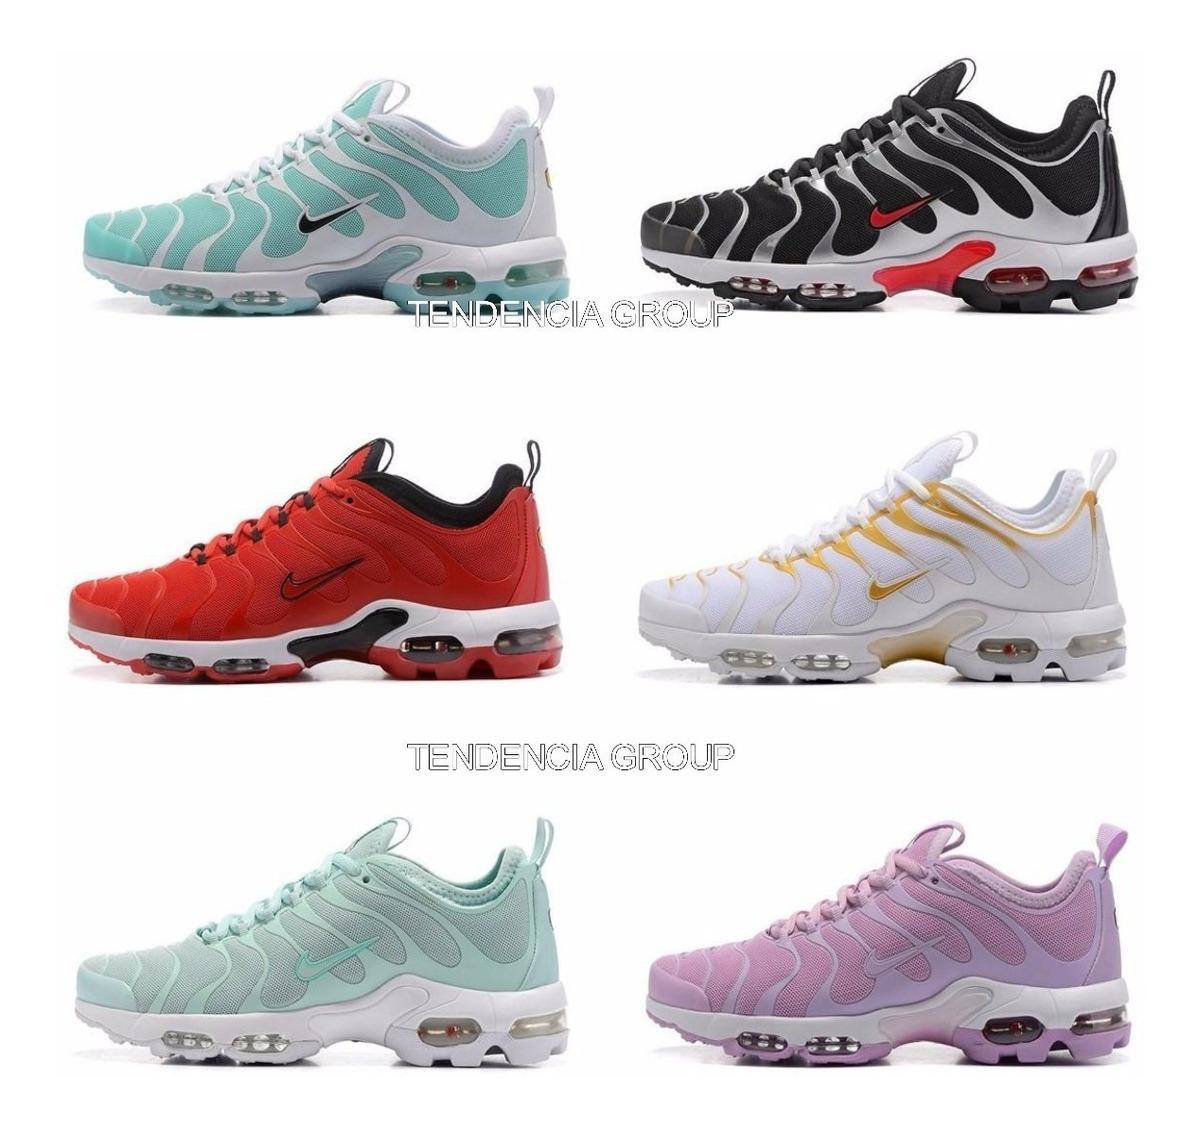 Nike Air Max Tn Ultra 90 2018 2019 Varon Y Mujer A Pedido